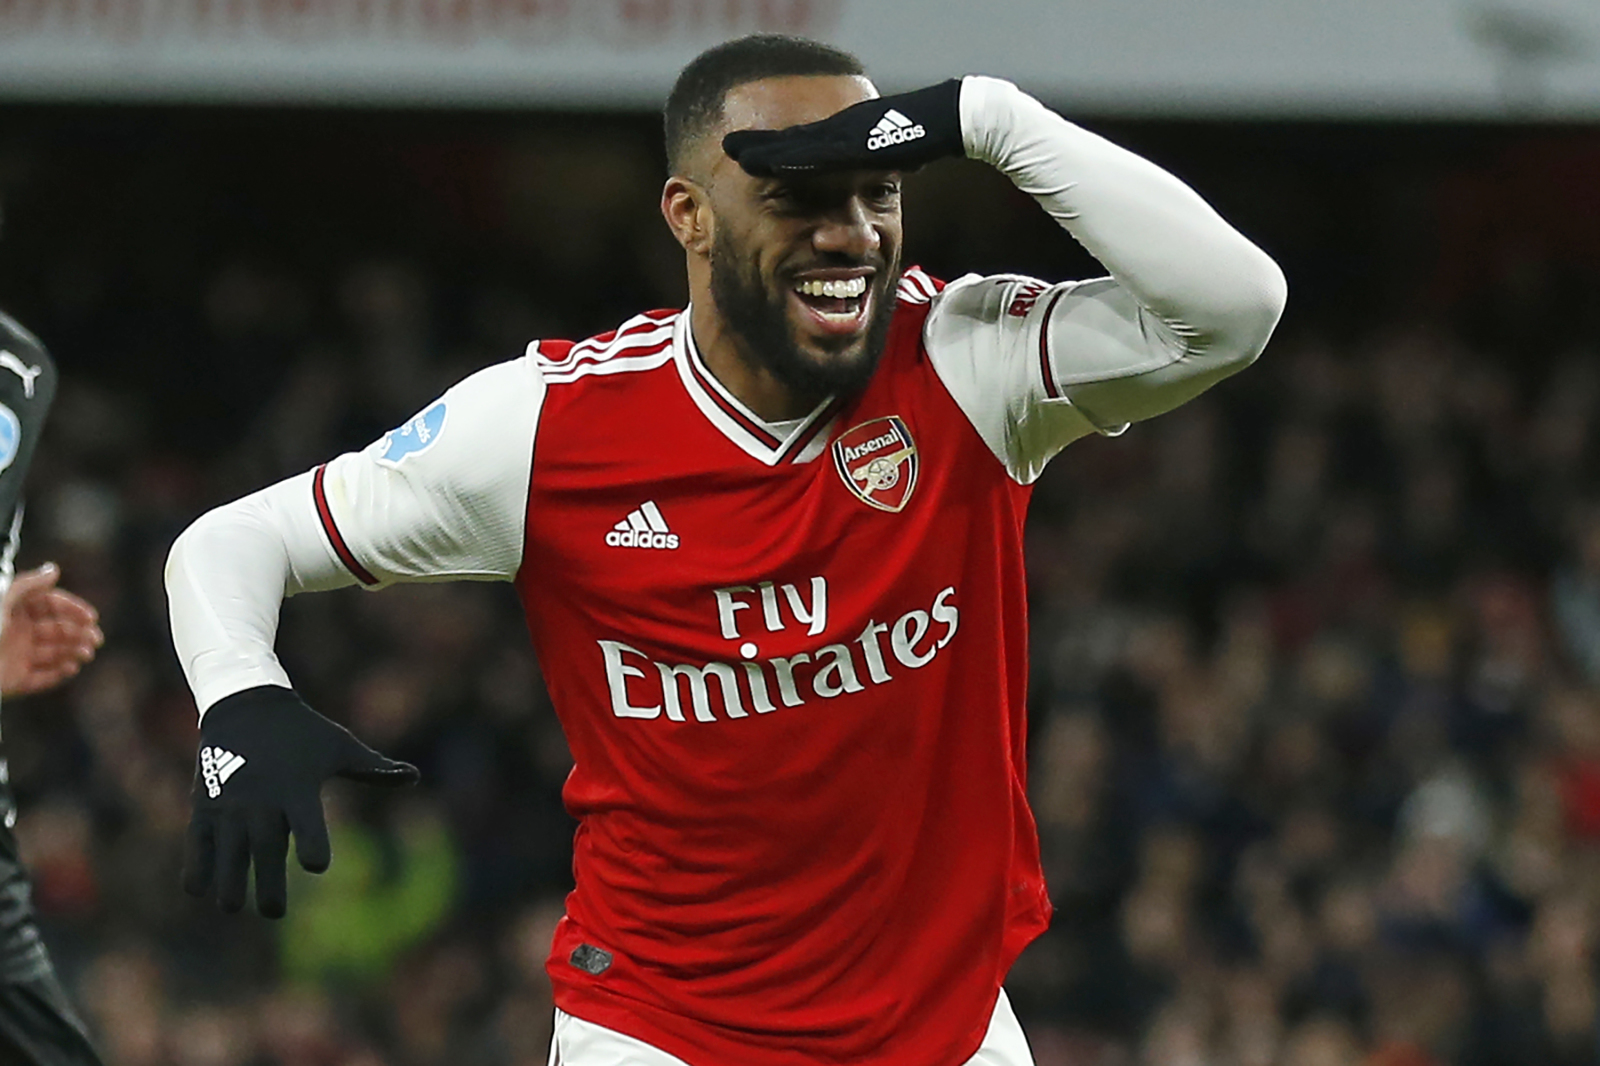 Arsenal: Alexandre Lacazette is underrated